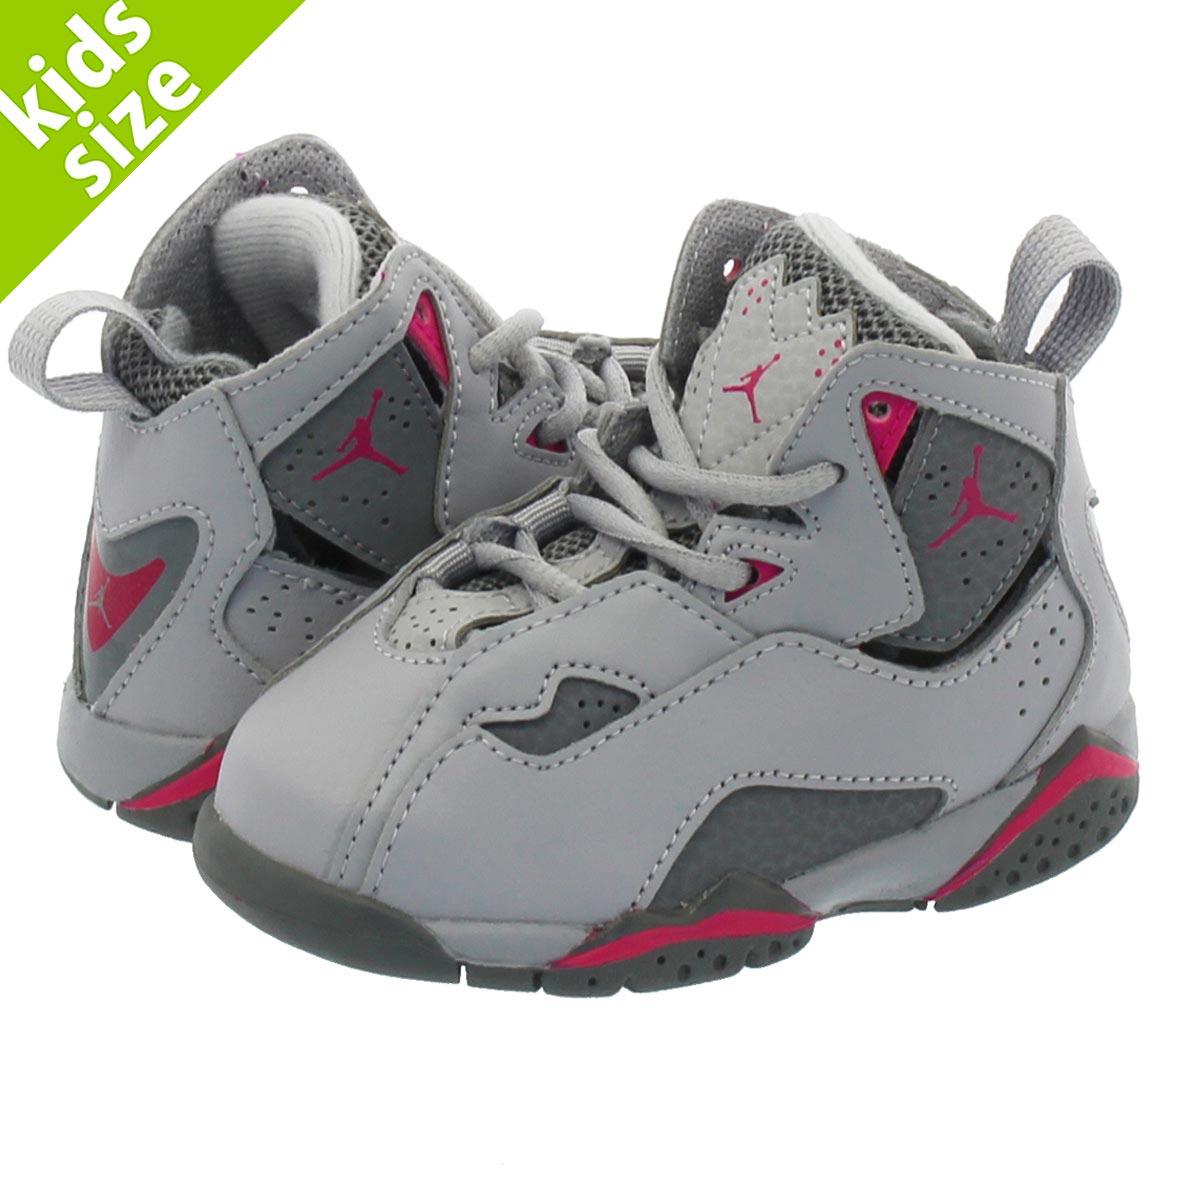 414f696c65cc NIKE JORDAN TRUE FLIGHT TD Nike Air Jordan toe roof light TD WOLF  GREY DEADLY PINK